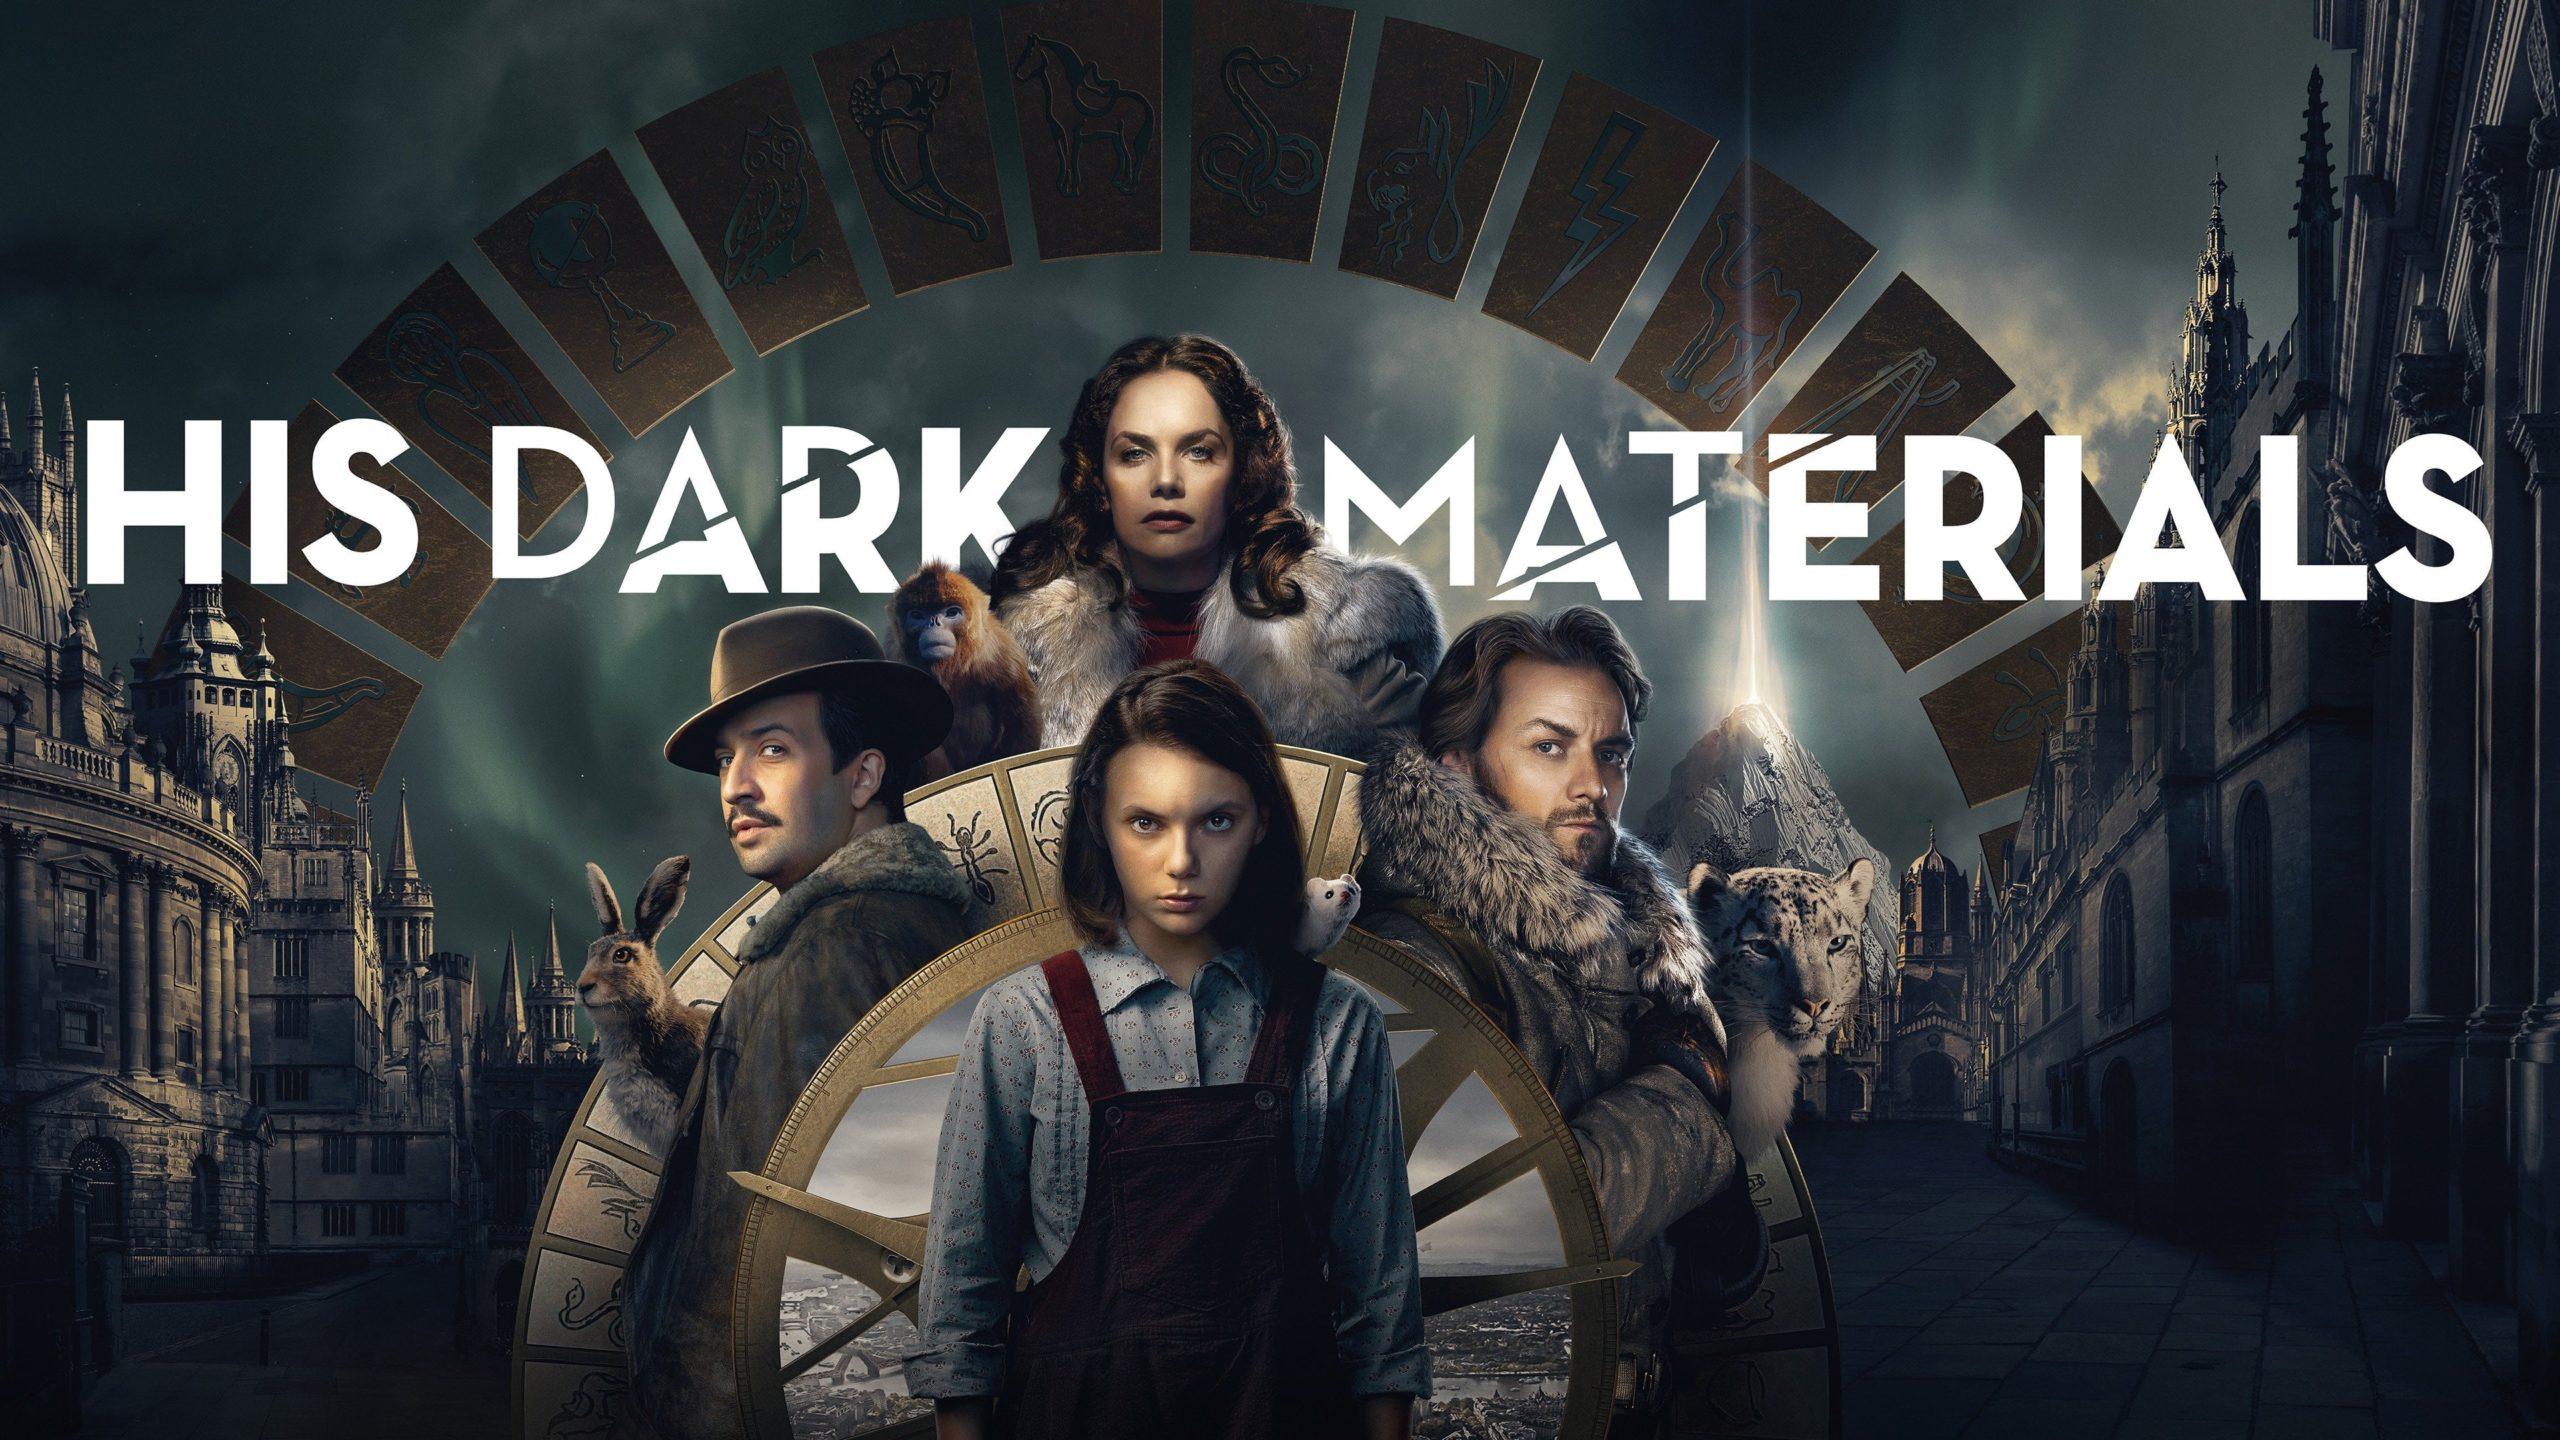 His Dark Materials Season 2 Episode 5